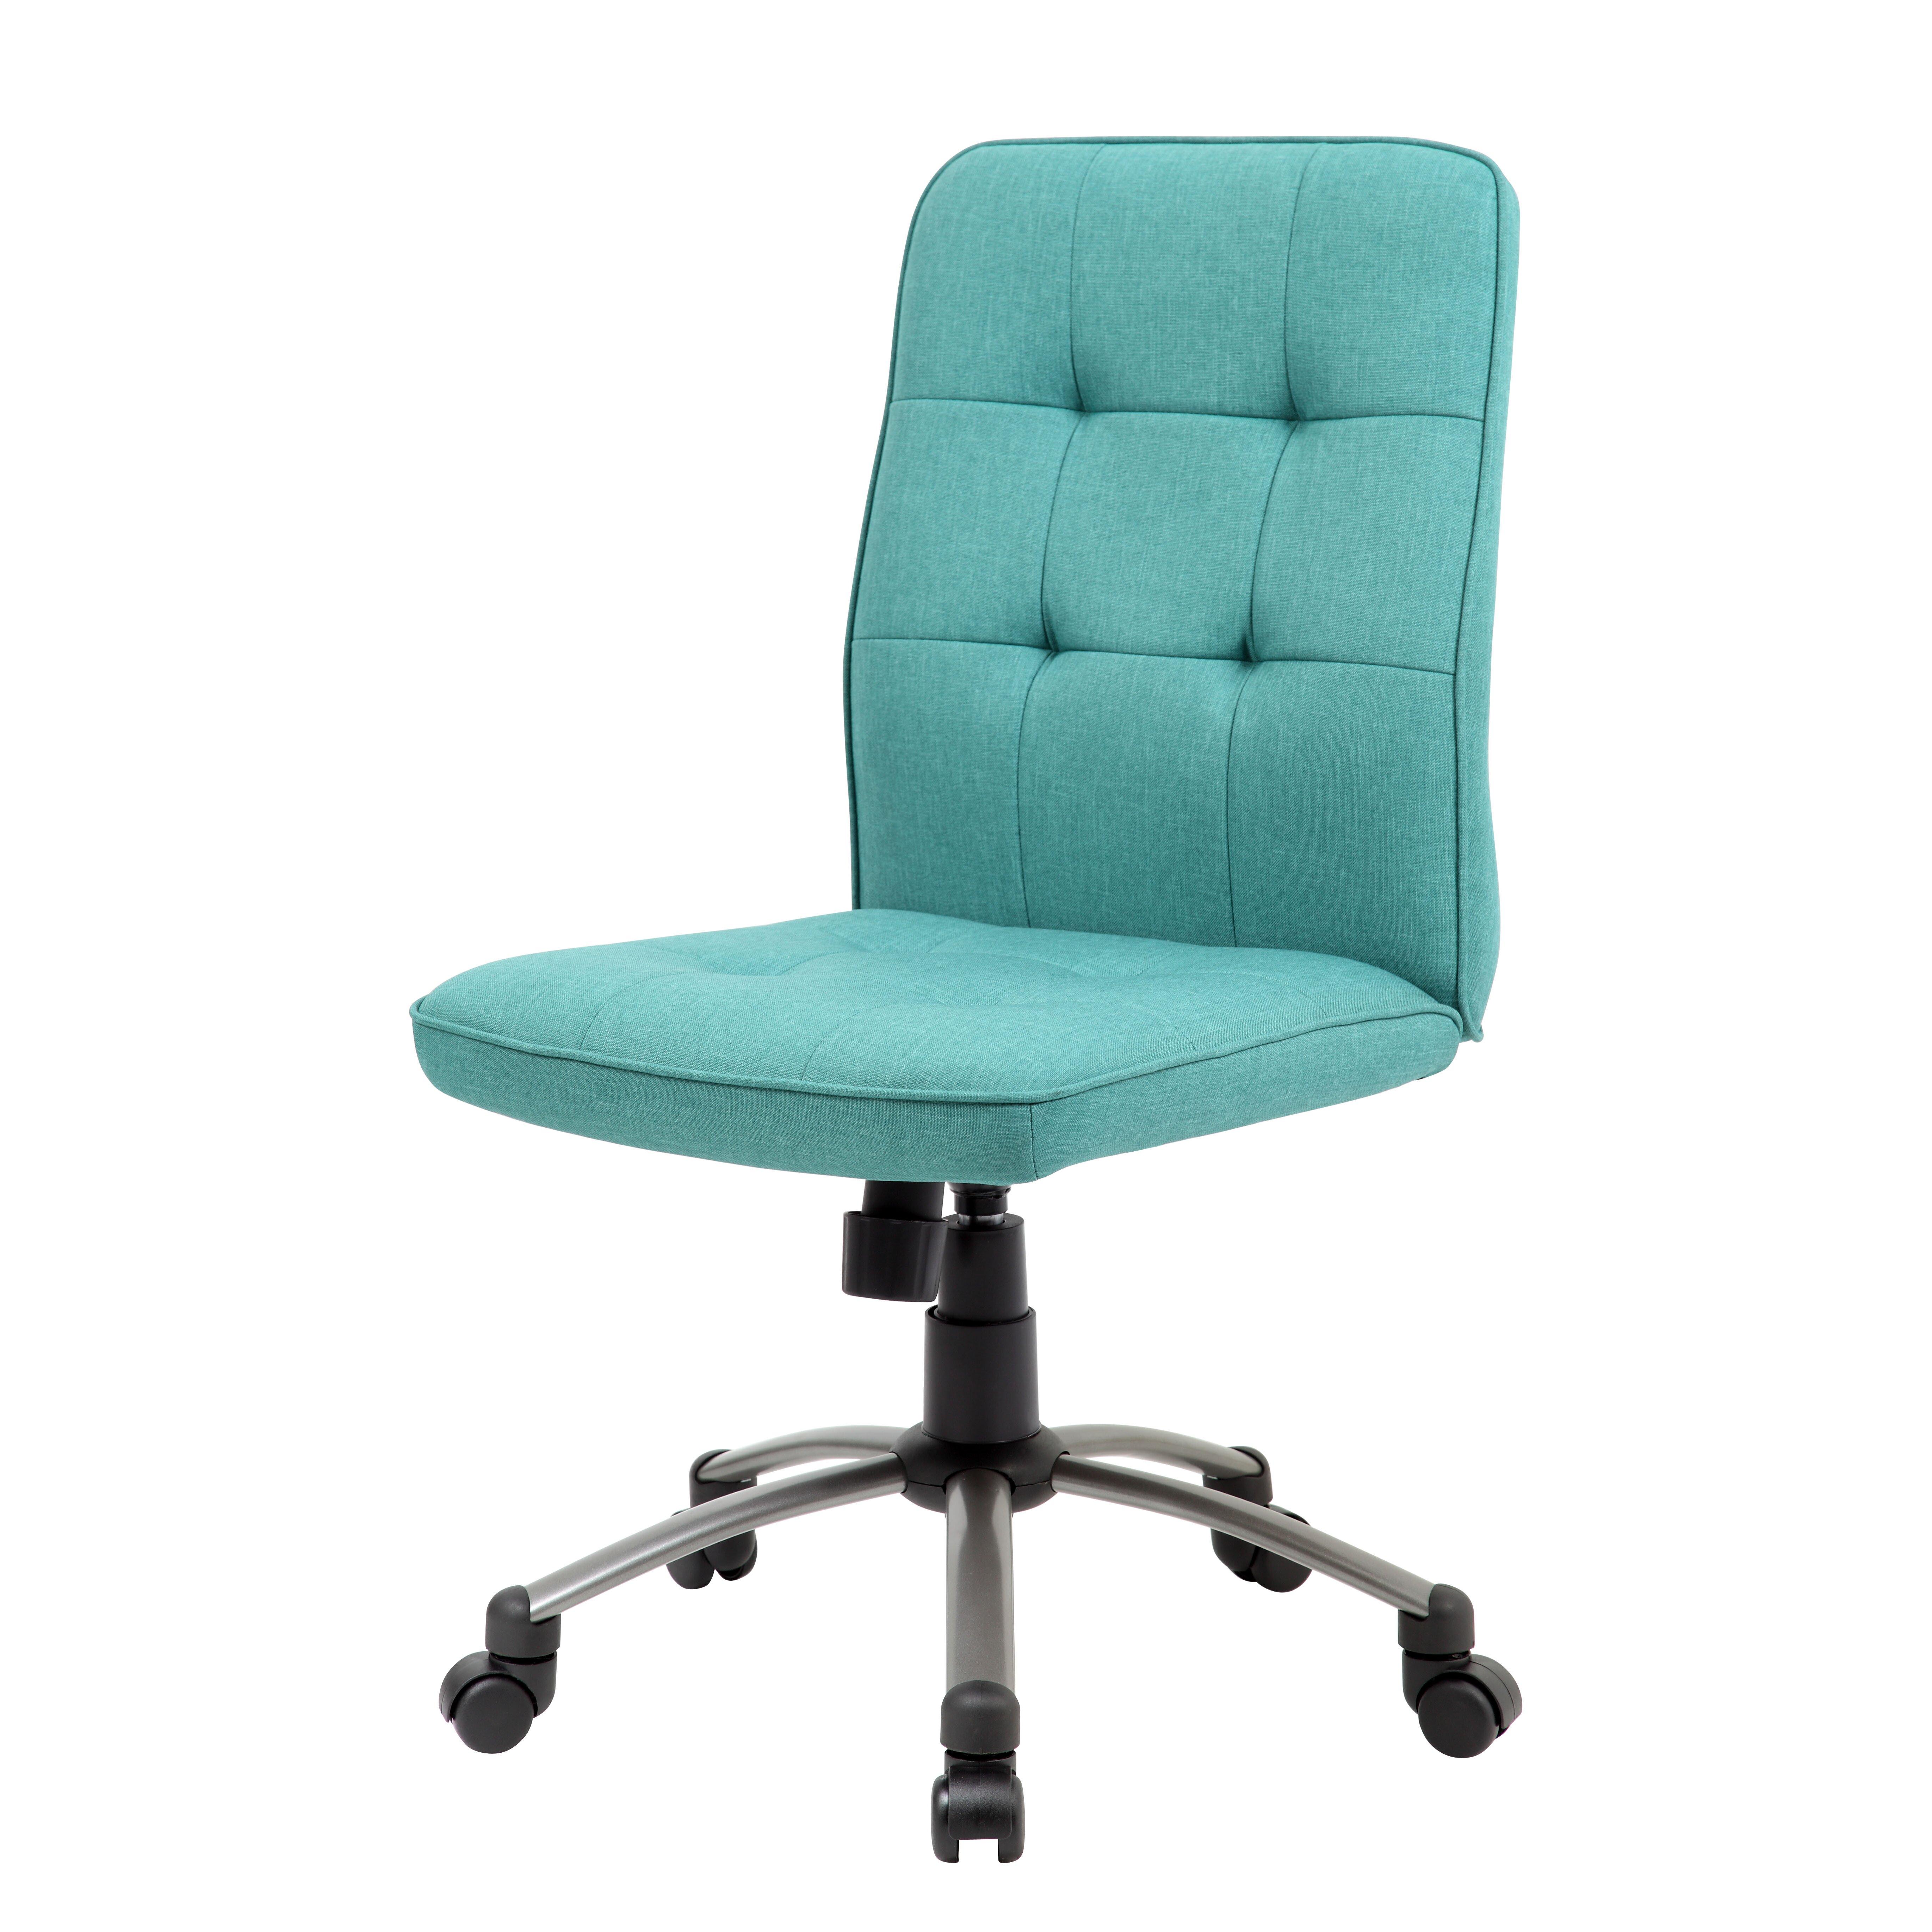 Zipcode Design Shellman Mid Back Desk Chair Reviews